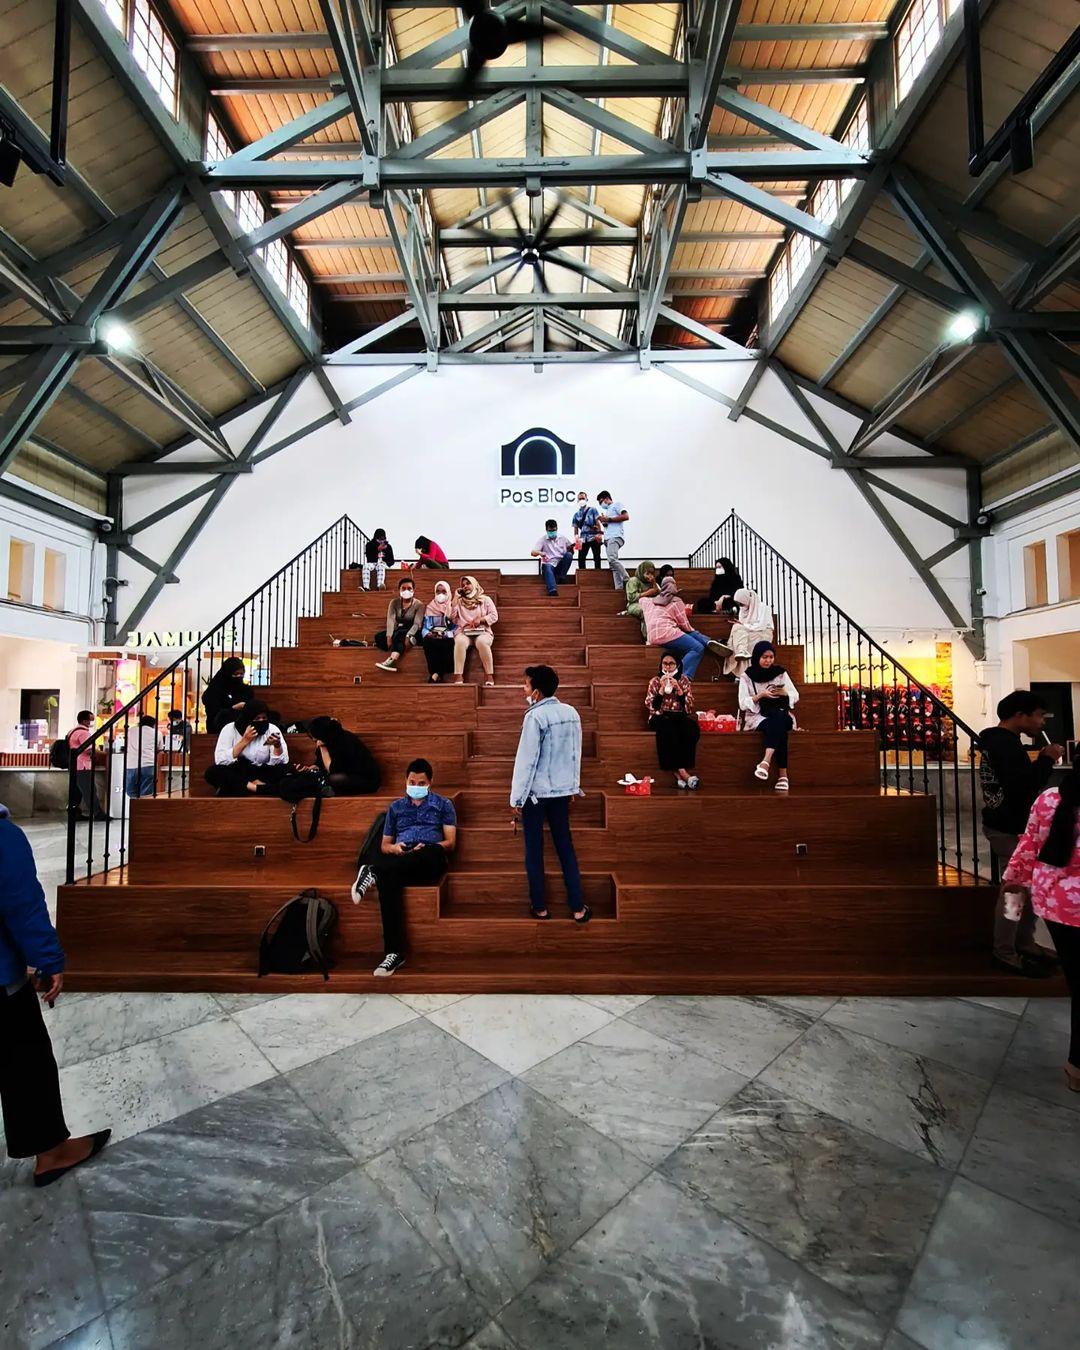 Suasana Pengunjung Di Pos Bloc Jakarta Image From @walking Around Id_